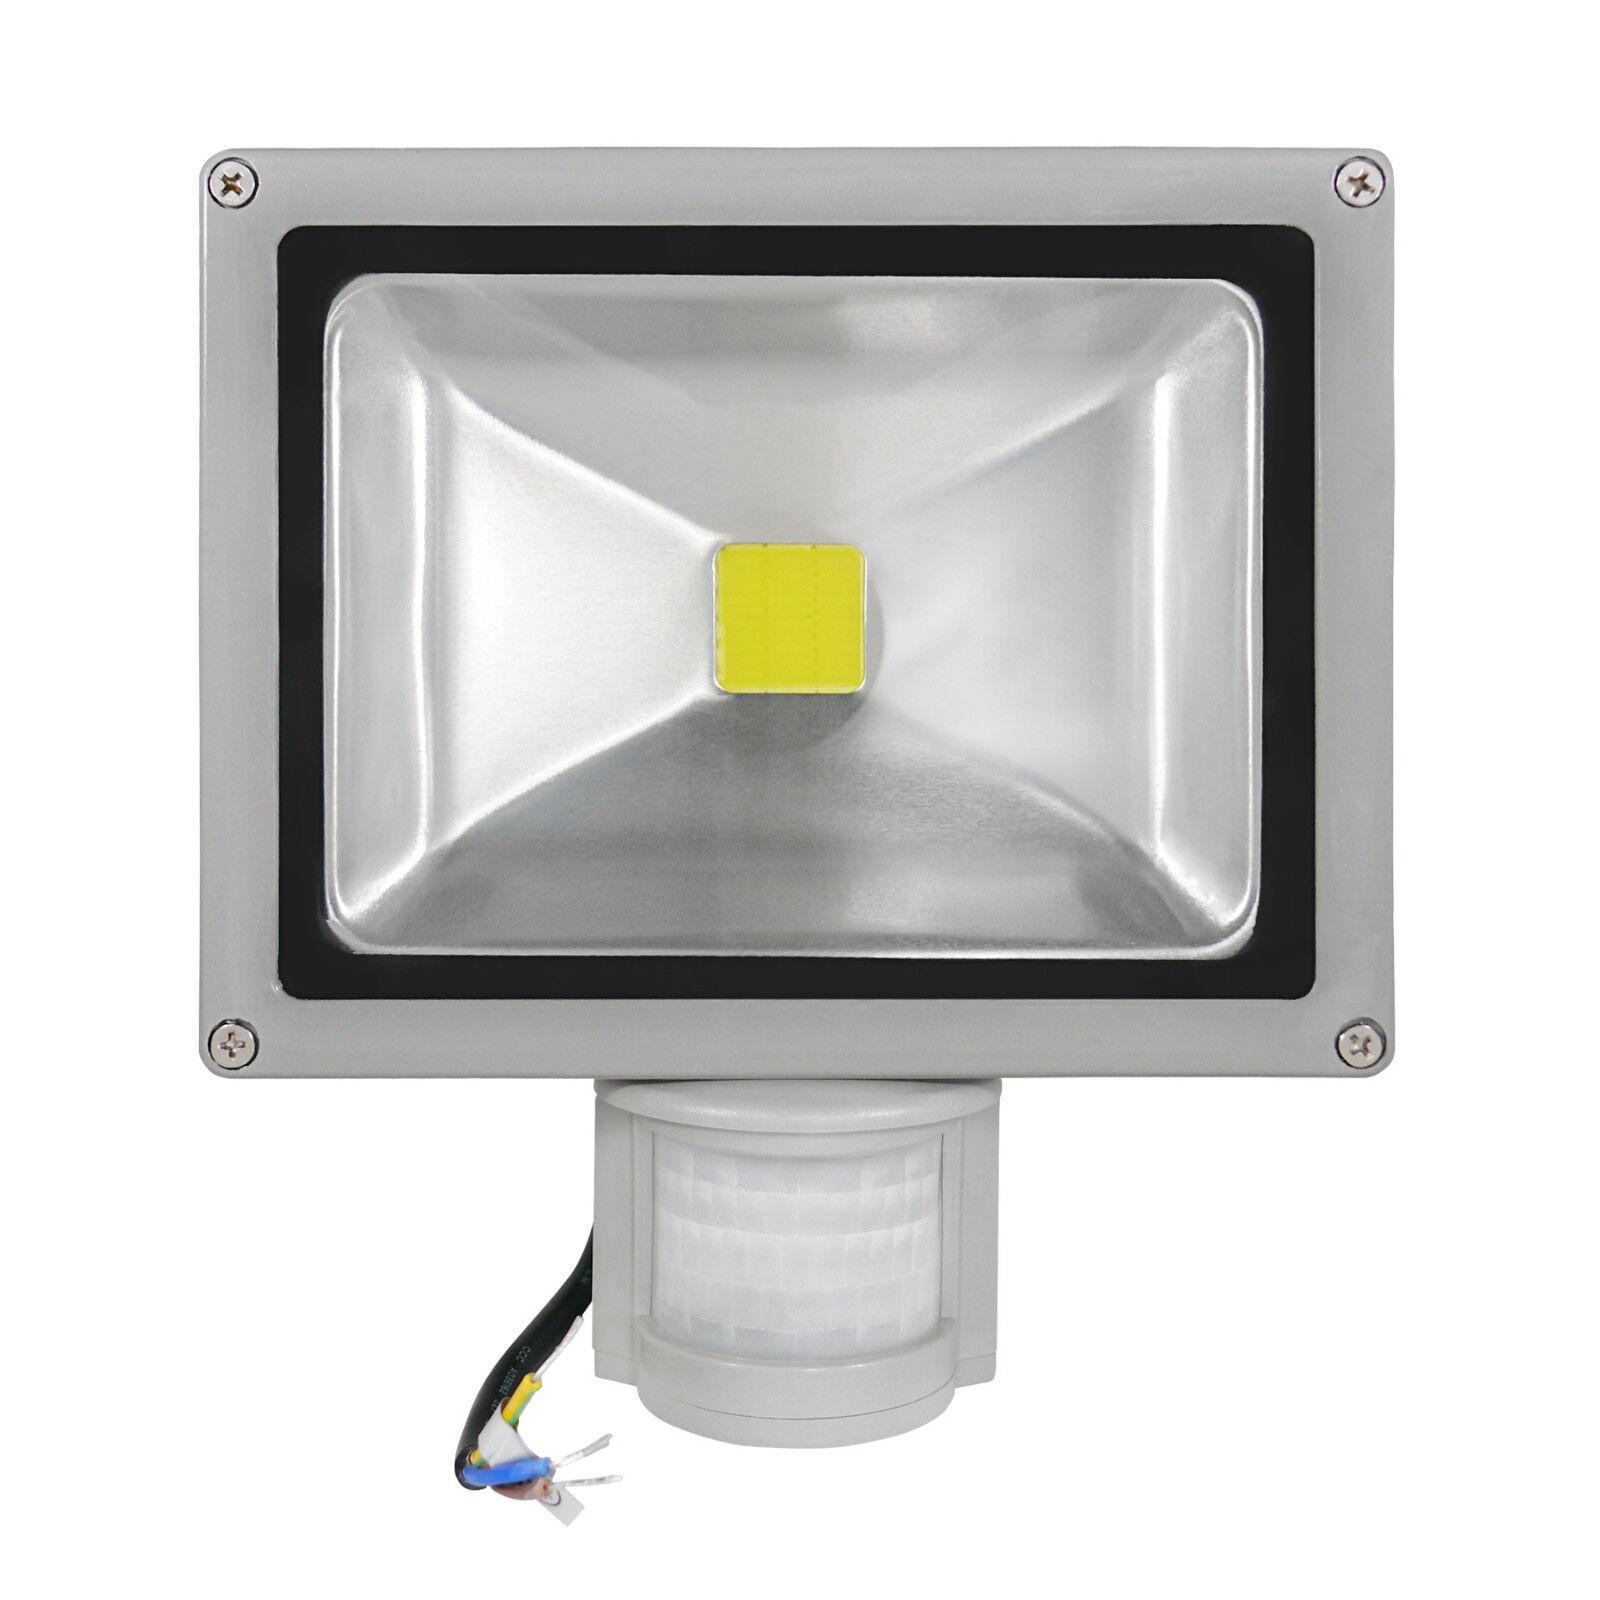 3x LED exterior eh cob LED eh 30 vatios kaltweiss con 180 ° detector de movimiento